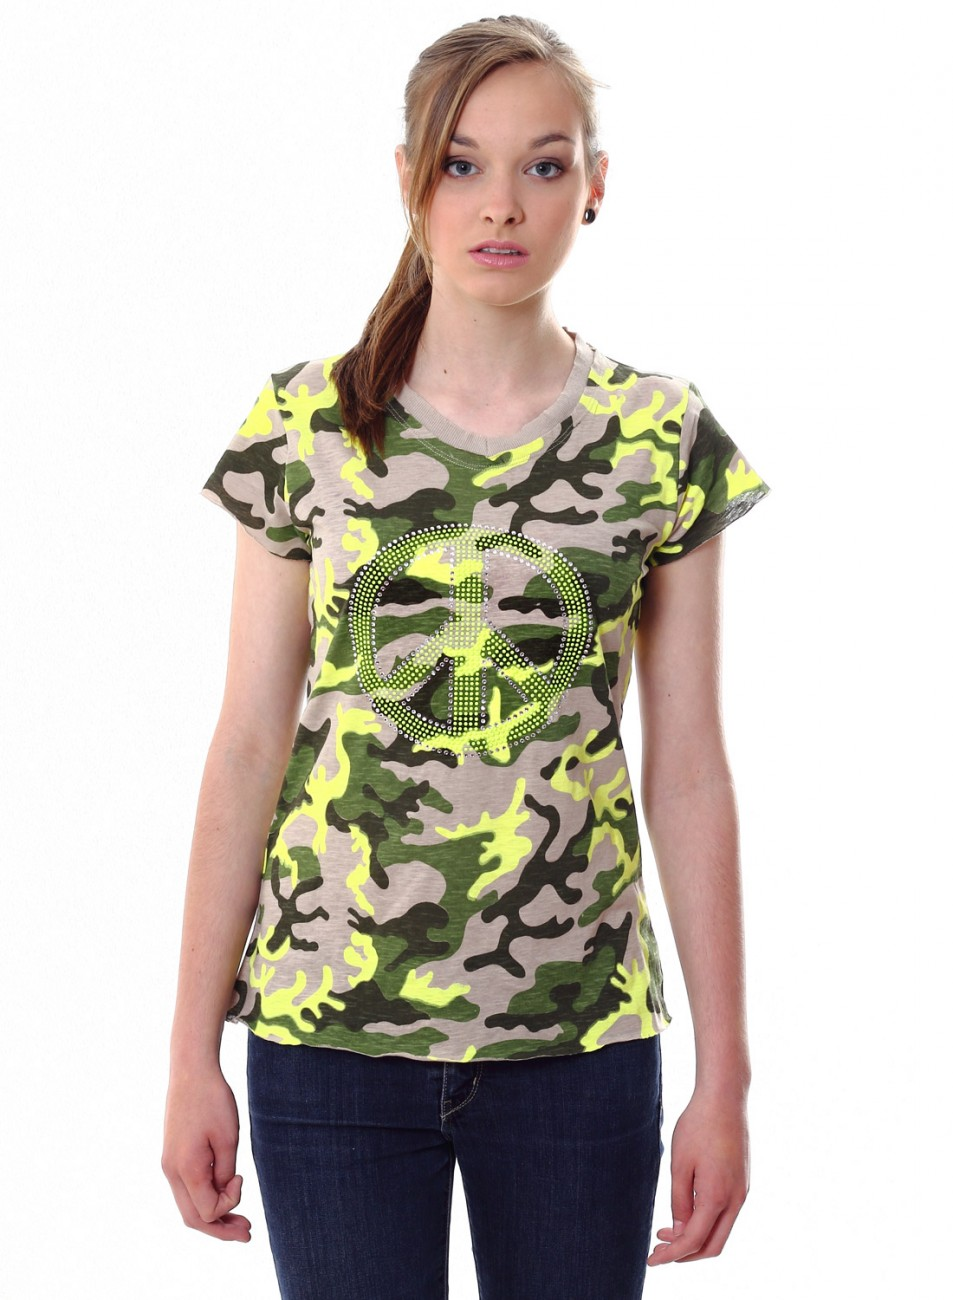 caspar damen shirt camouflage peace neon strass